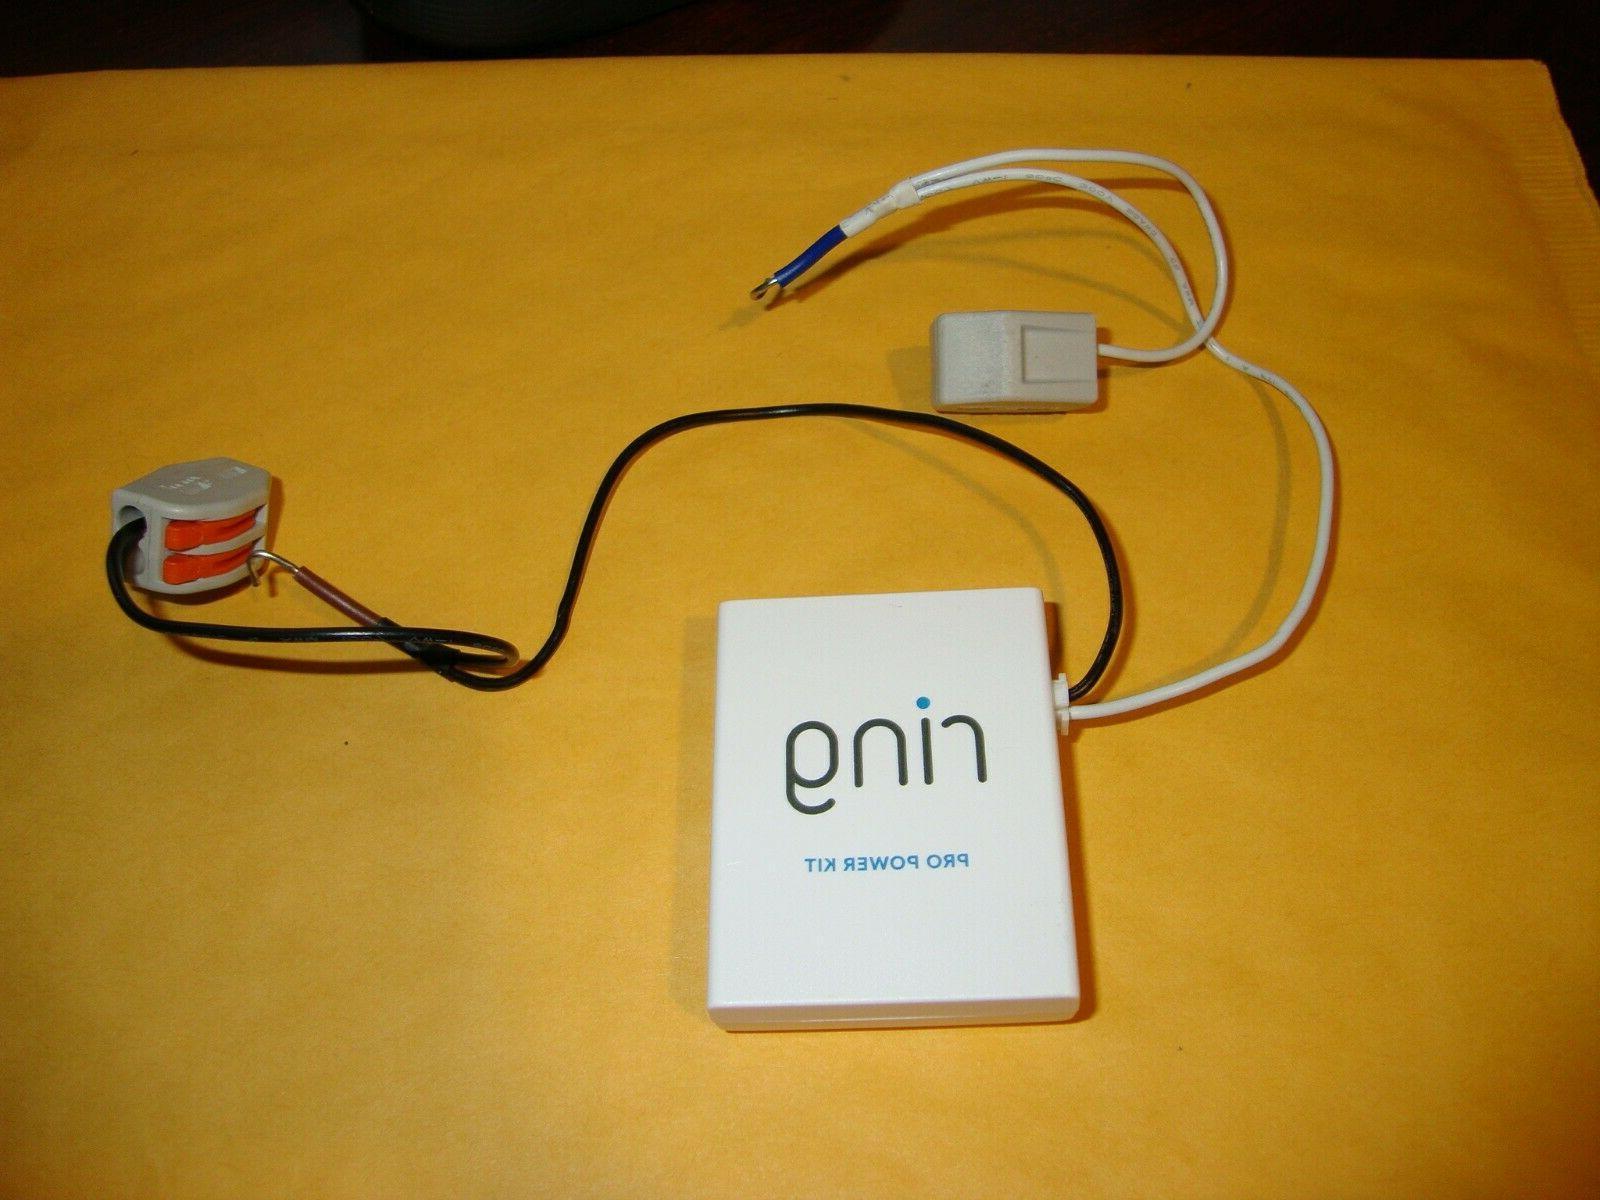 ring doorbell pro 2 wi fi power